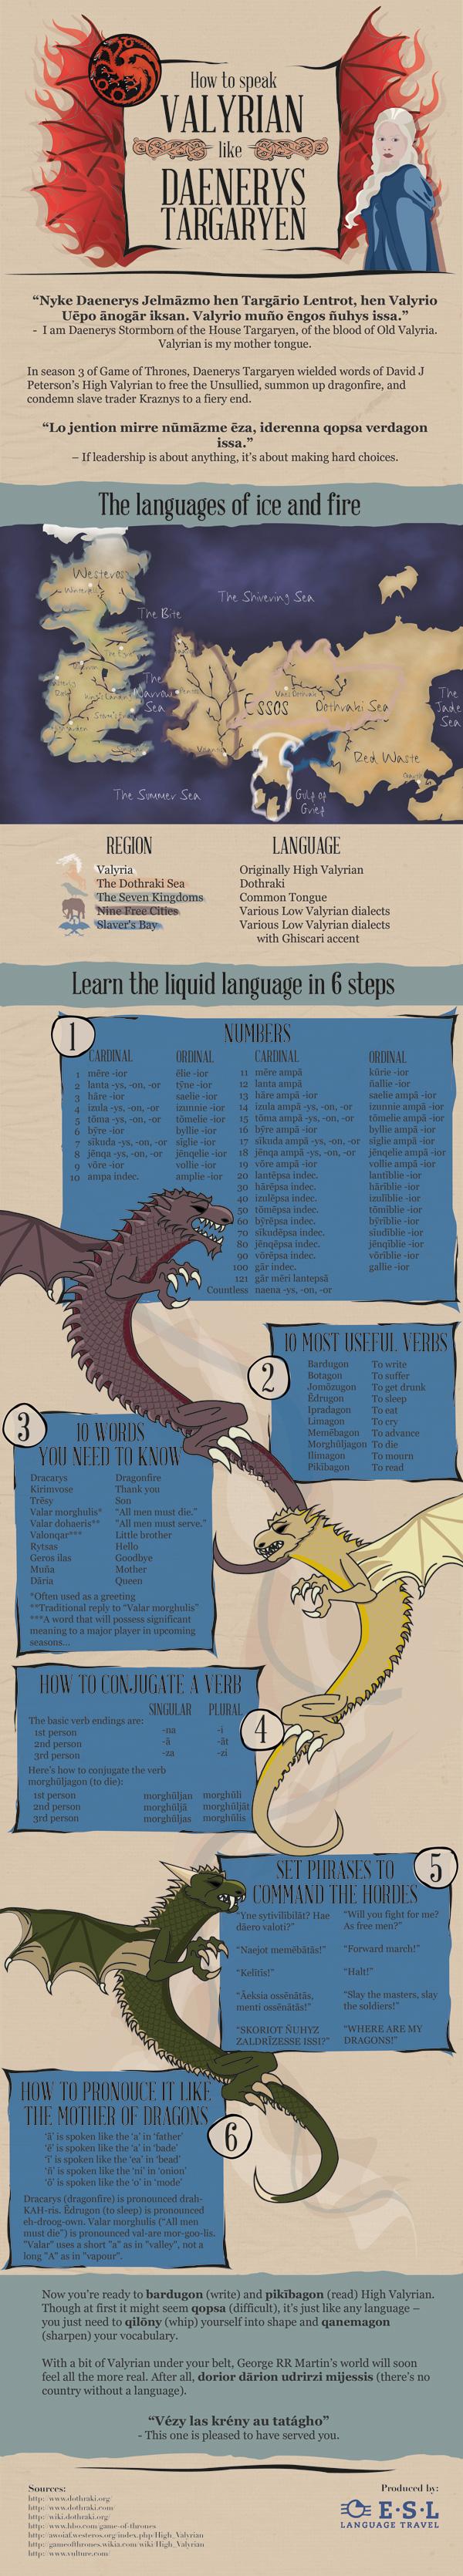 How to speak Valyrian like Daenerys Targaryen | ESL.co.uk